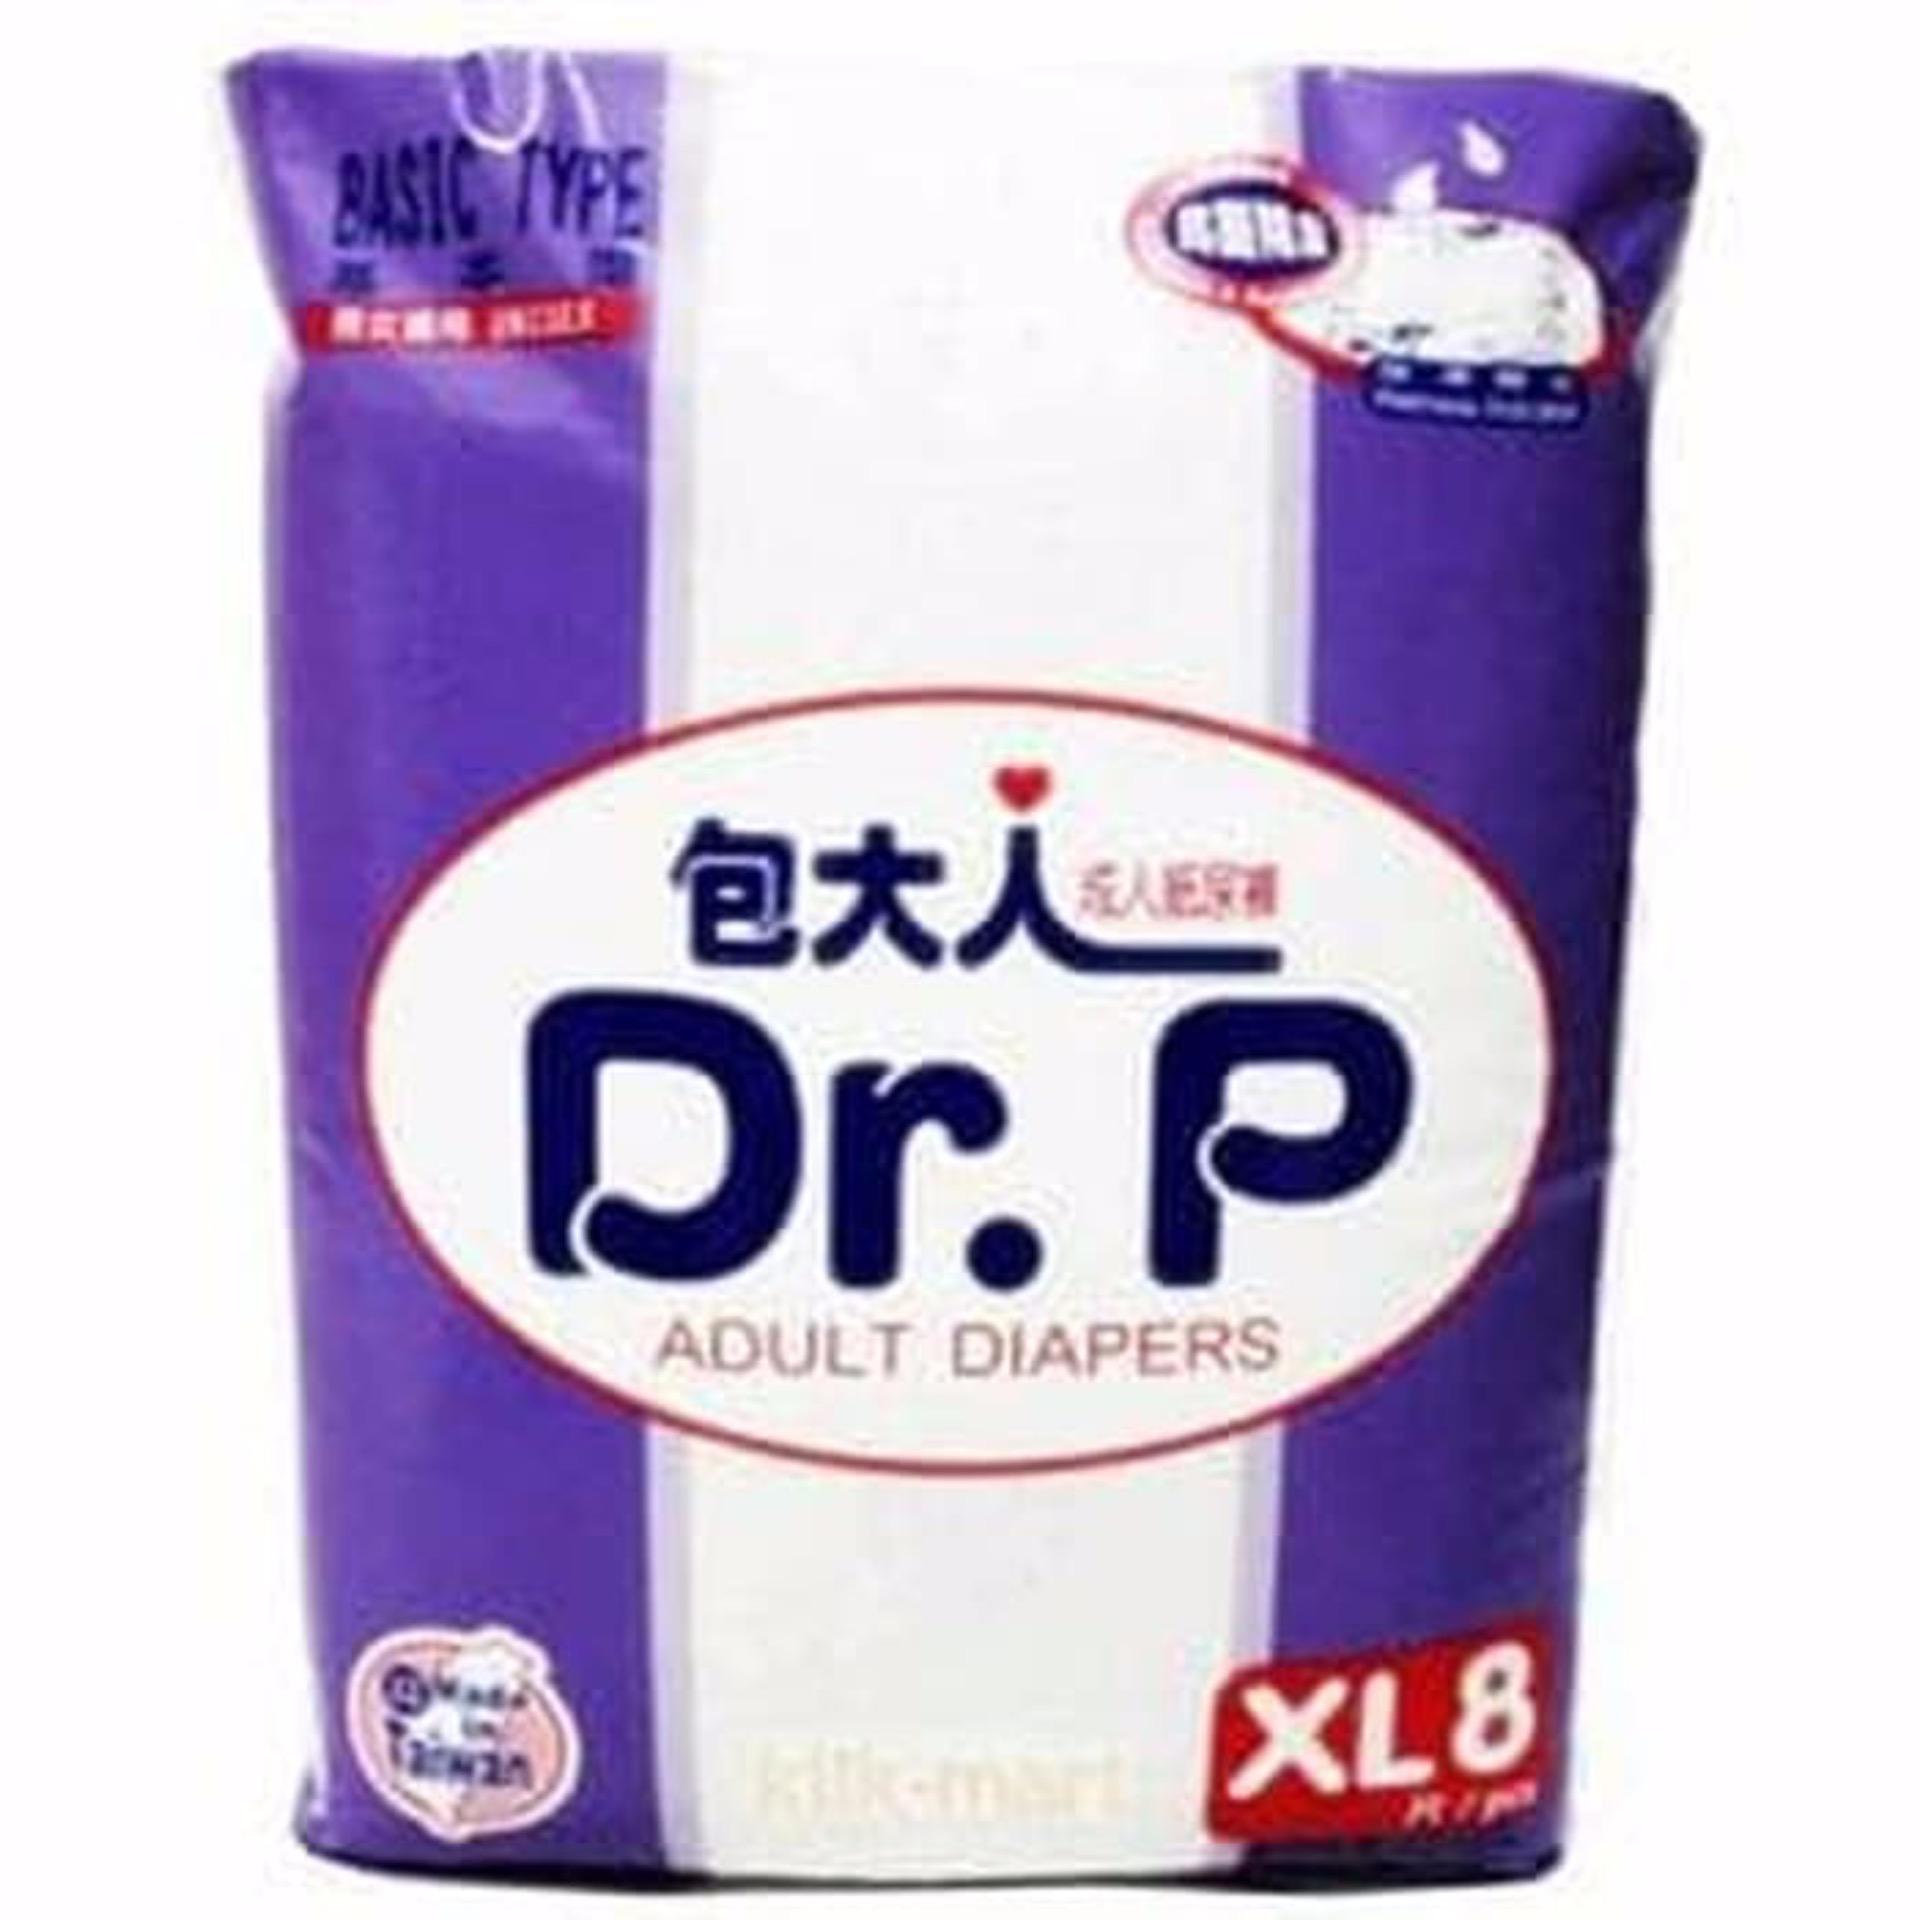 P Adult Diapers, Popok Dewasa, Popok Orang Tua, Popok Orang Sakit. IDR 70,000 IDR70000. View Detail. Dr.p XL8 Basic Type